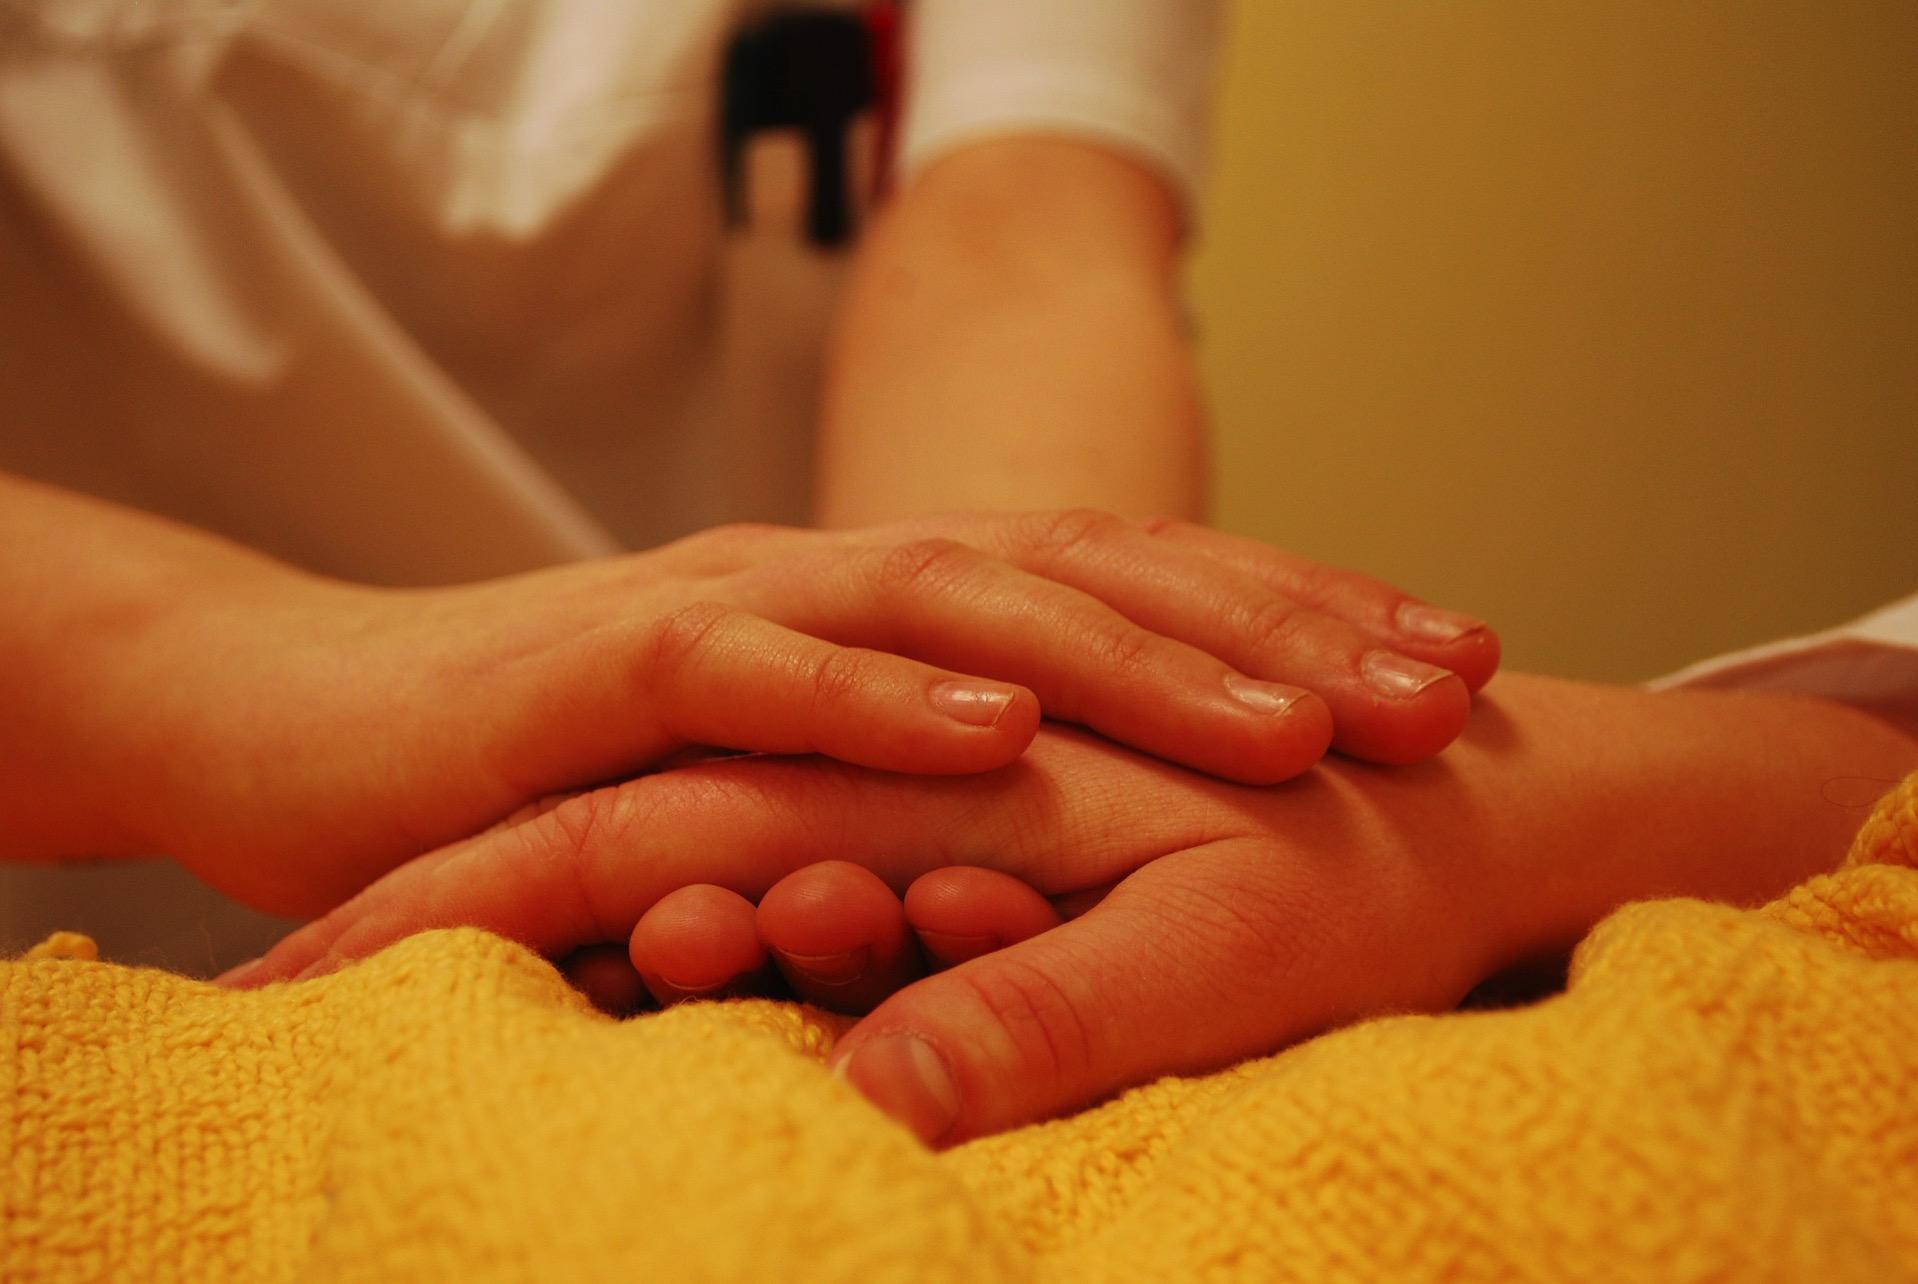 genba - 介護福祉士の仕事内容